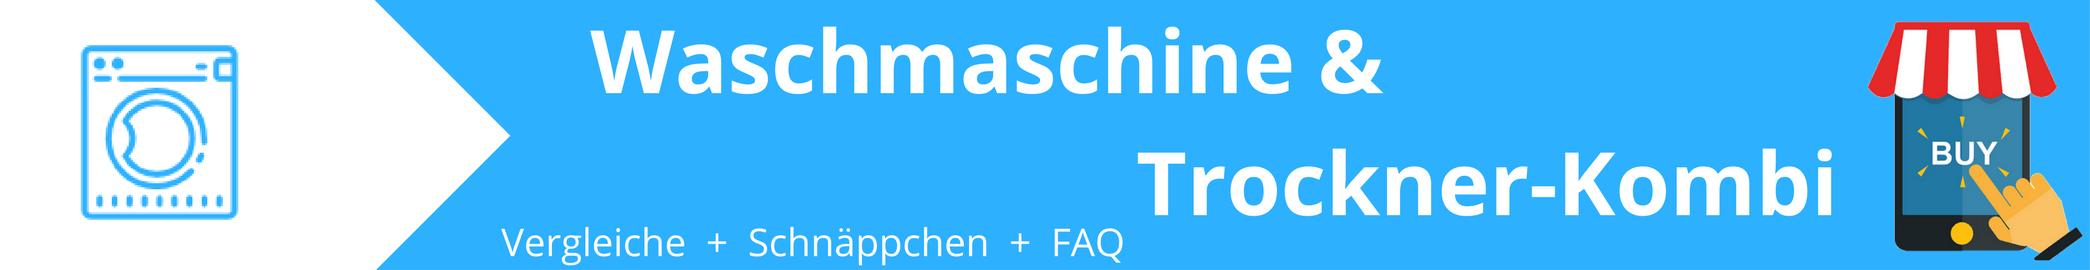 Waschmaschine & Trockner-Kombi